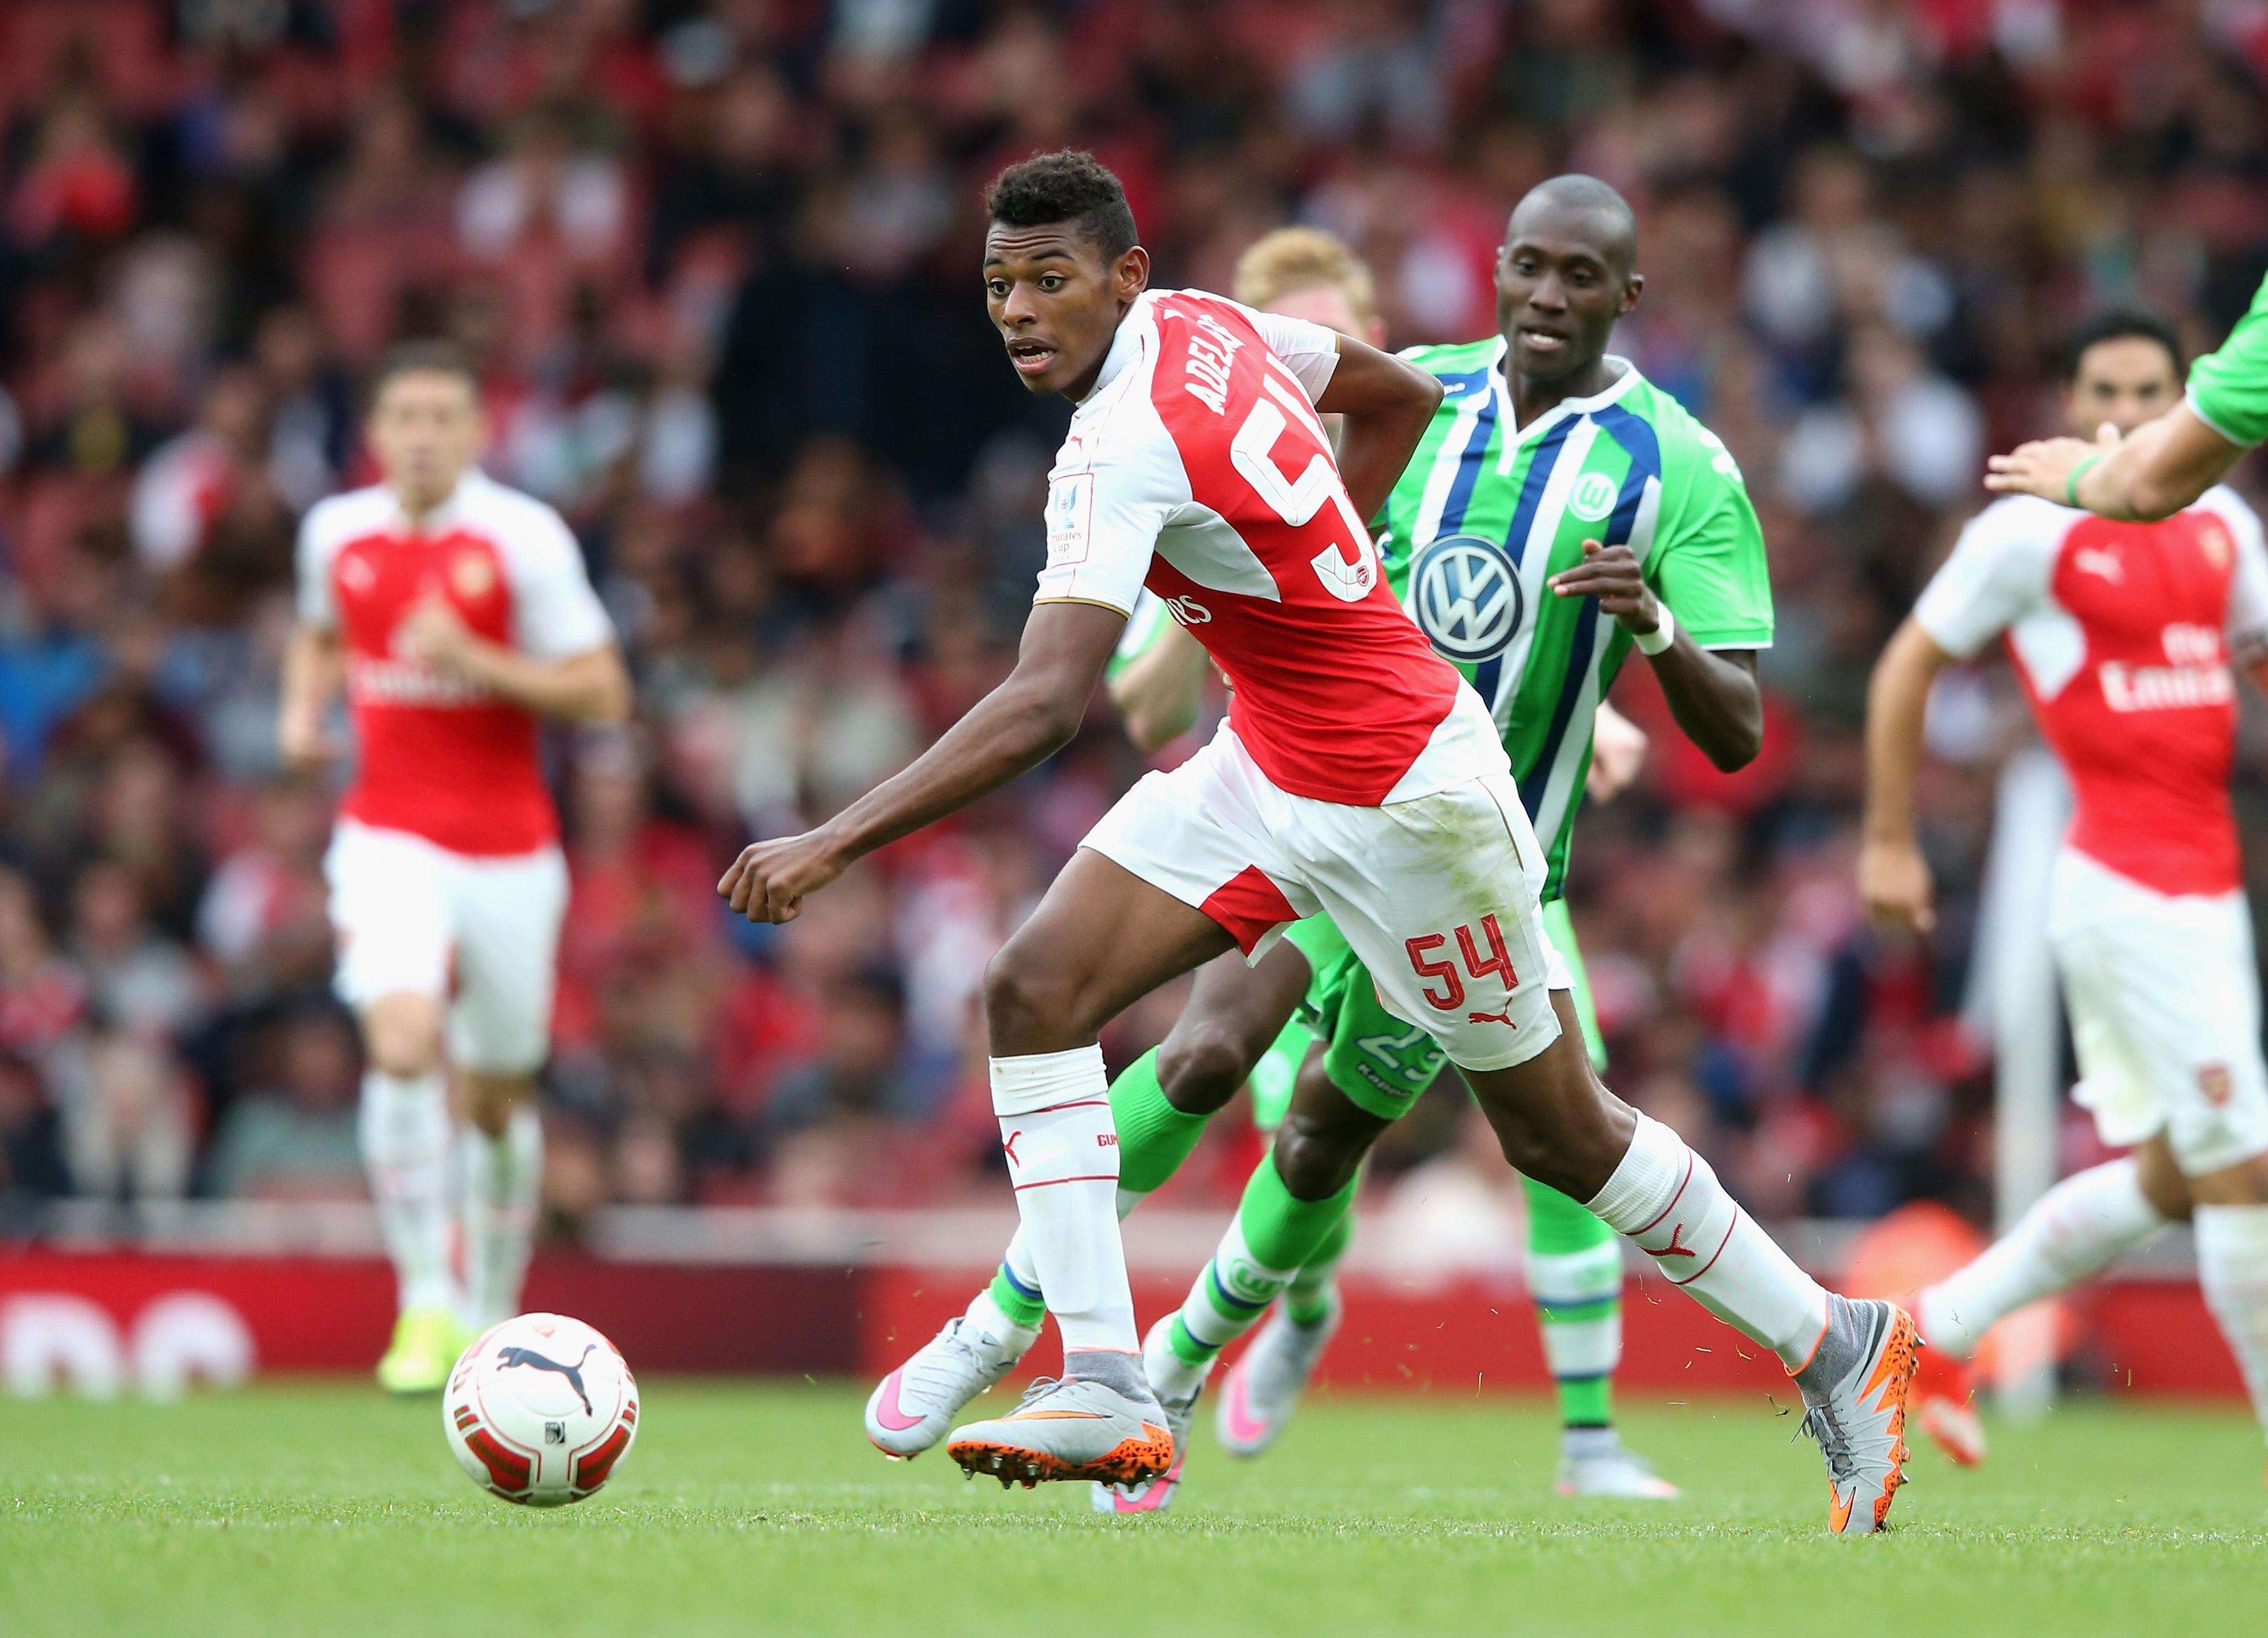 Arsenal v VfL Wolfsburg - Emirates Cup